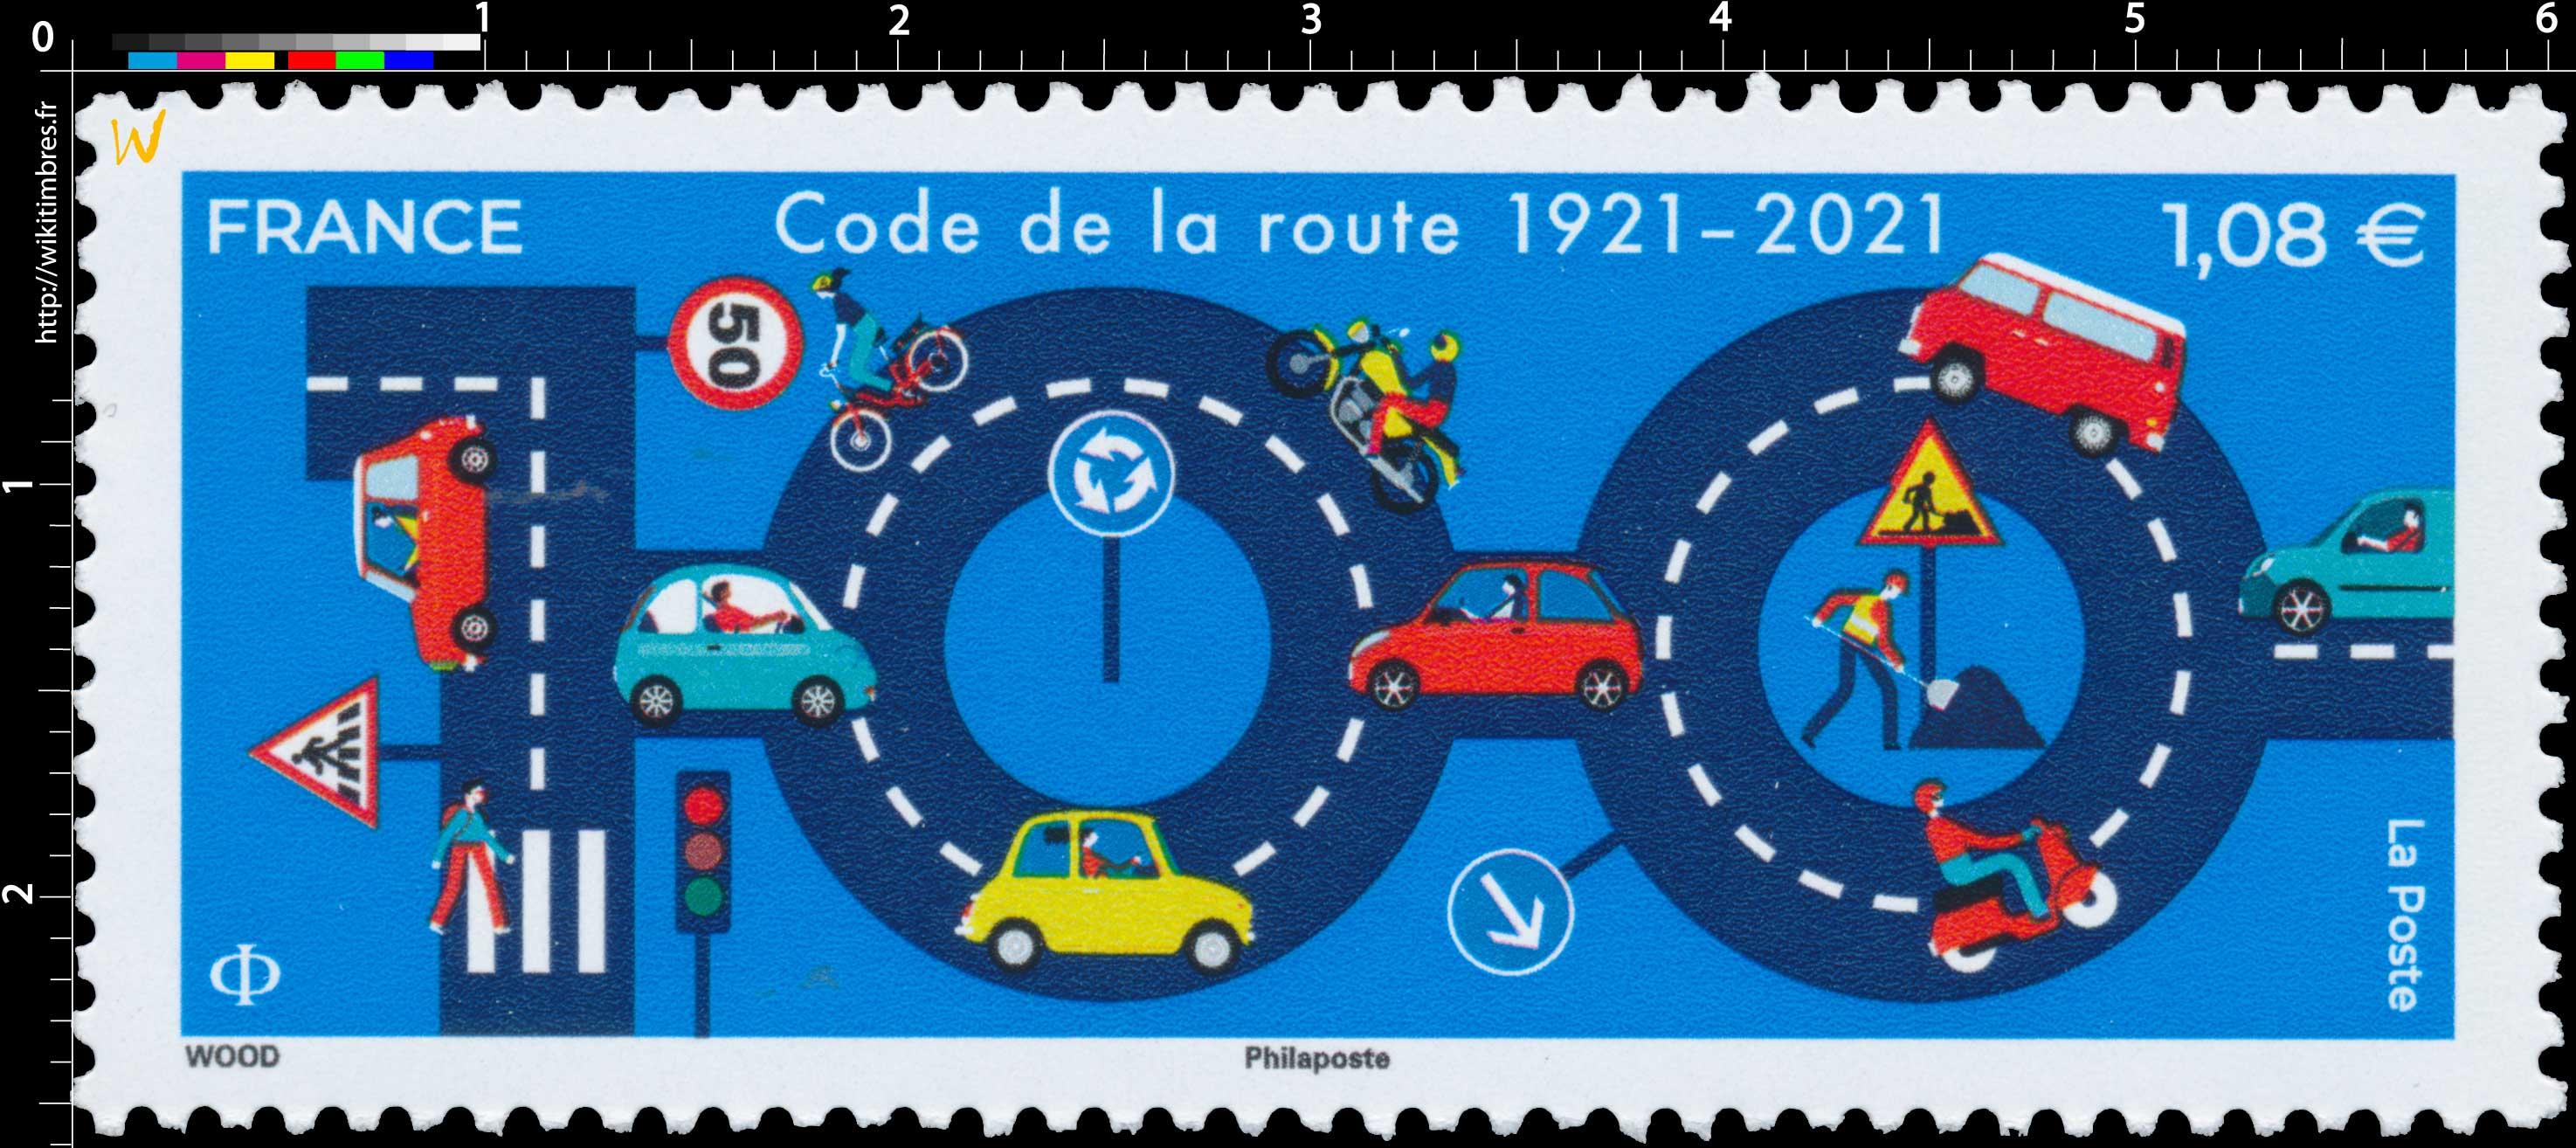 2021 Code de la route 1921 -  2021